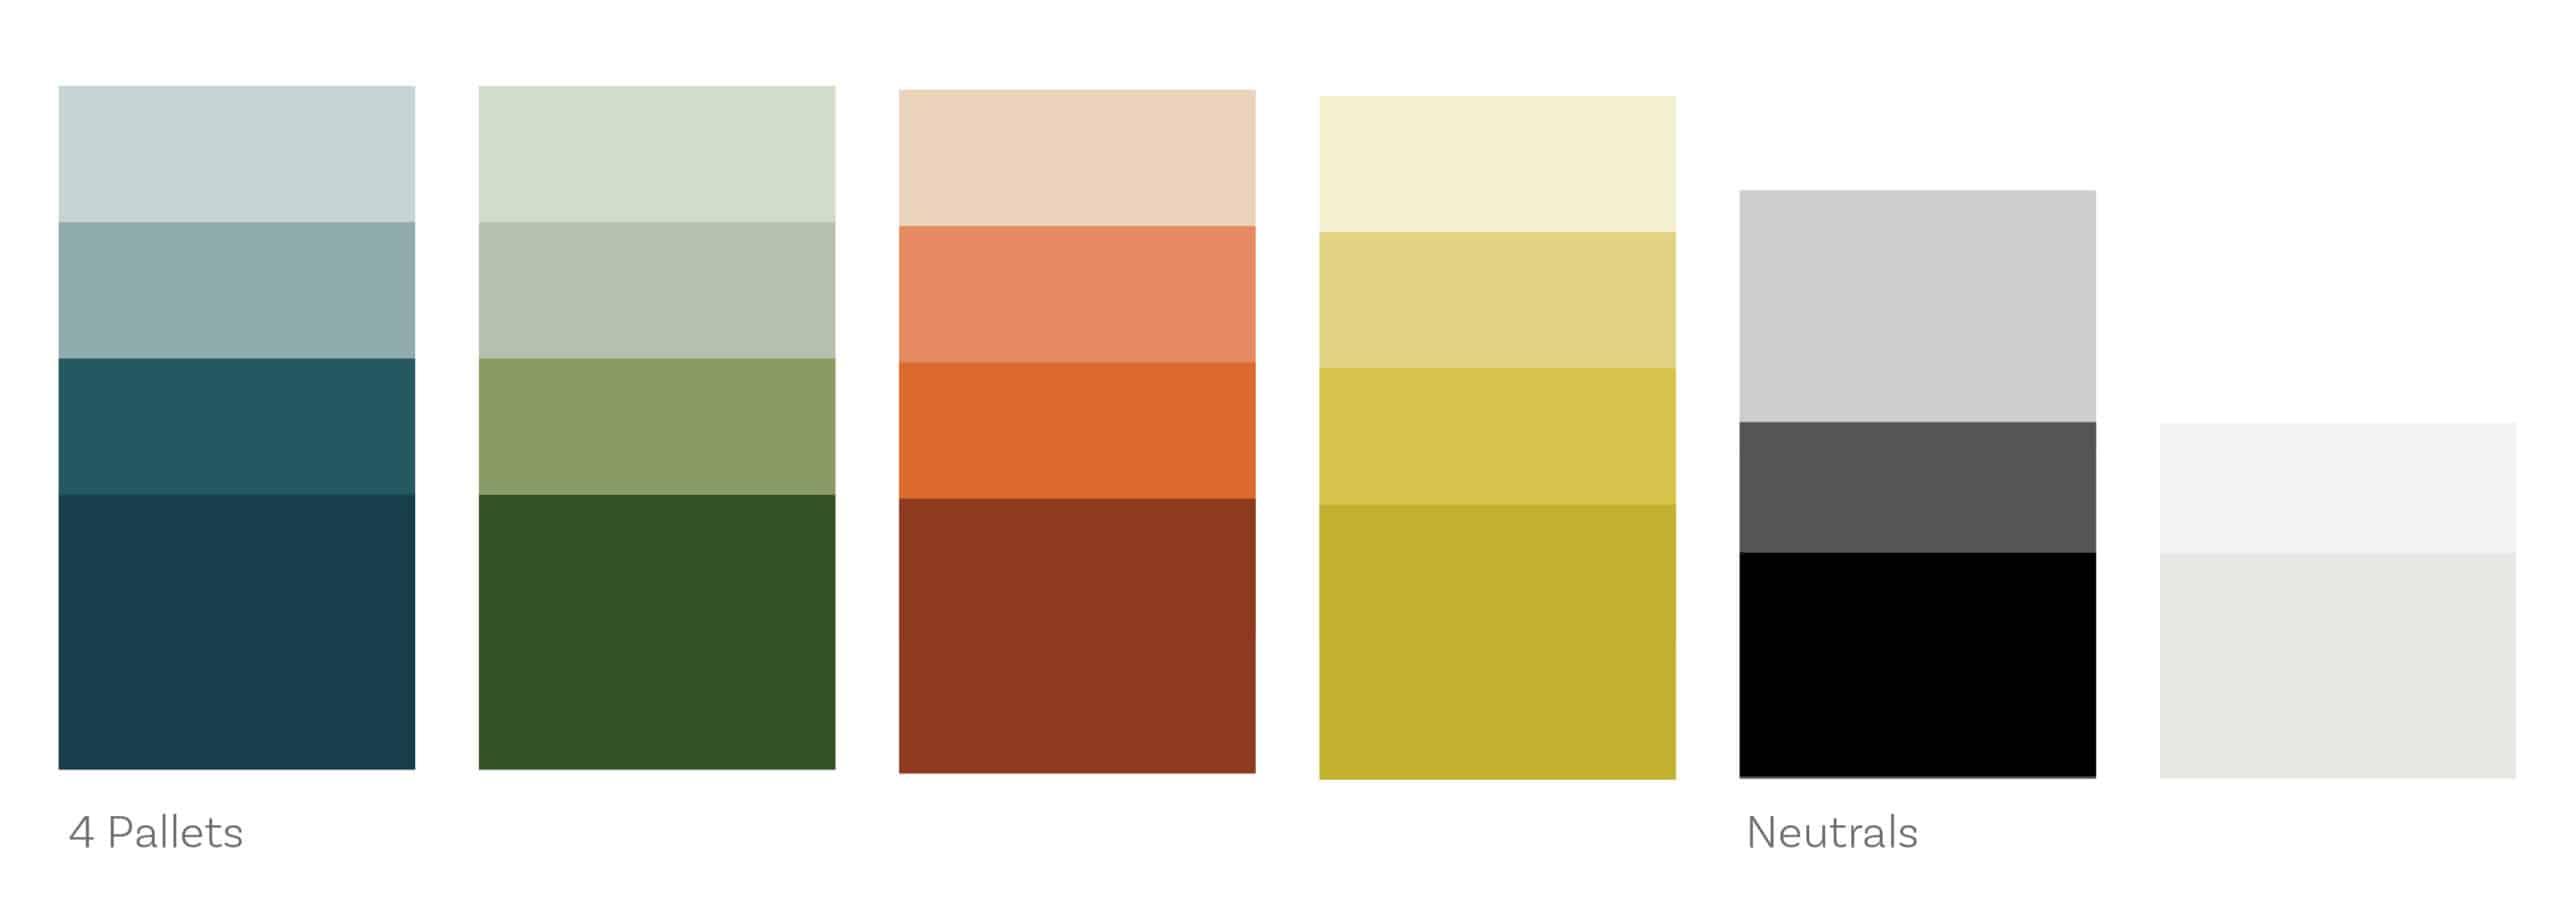 Human_Branding_By_Stellen_Design_Color Pallet